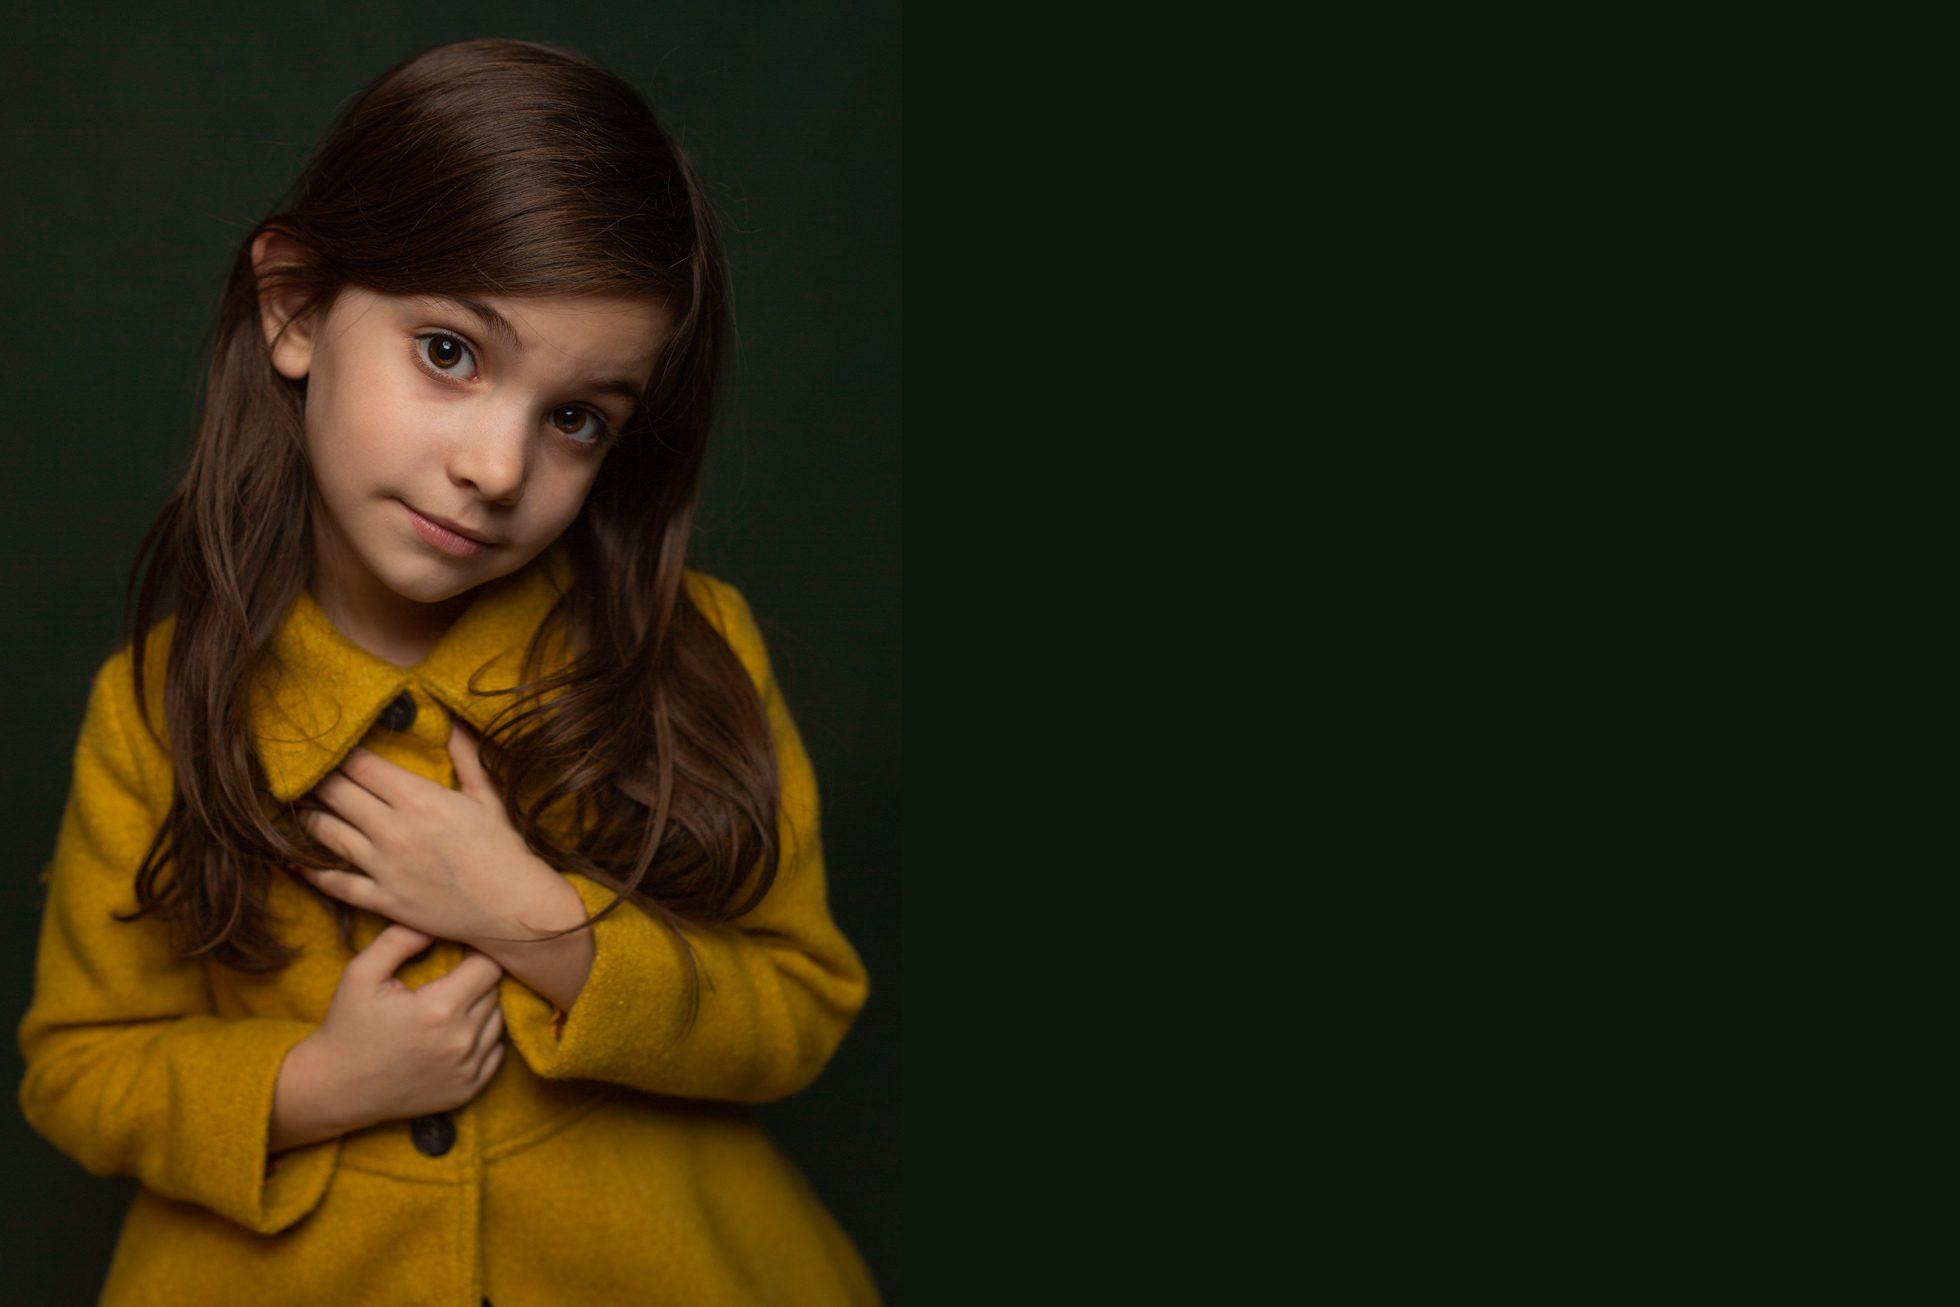 Girl in Yellow Jacket